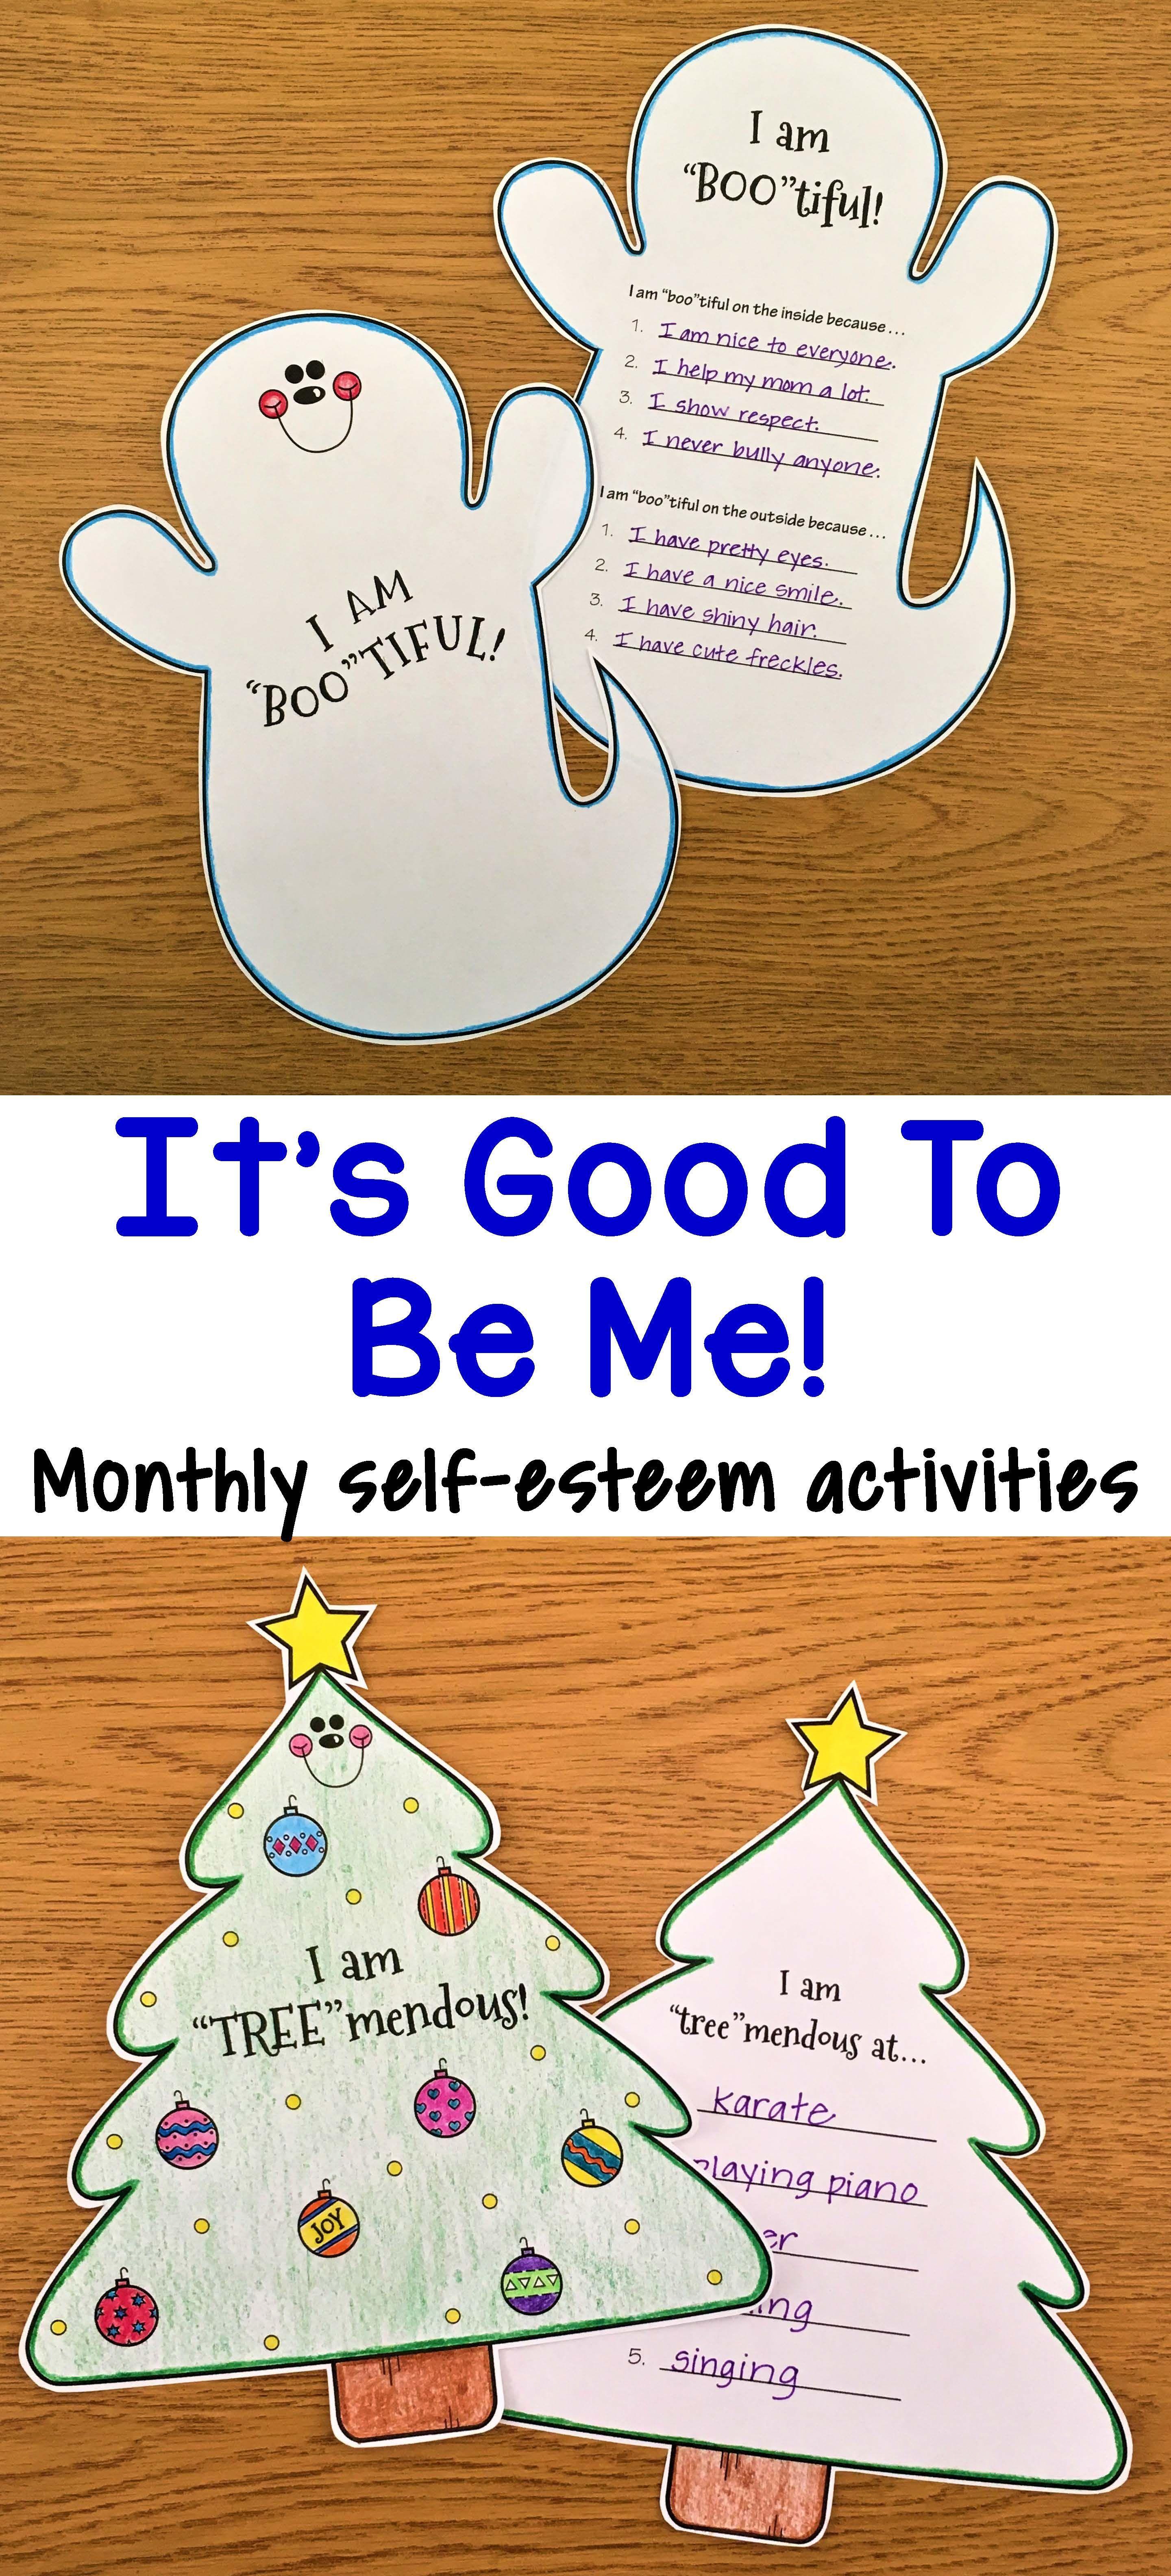 Self Esteem Activities With Images